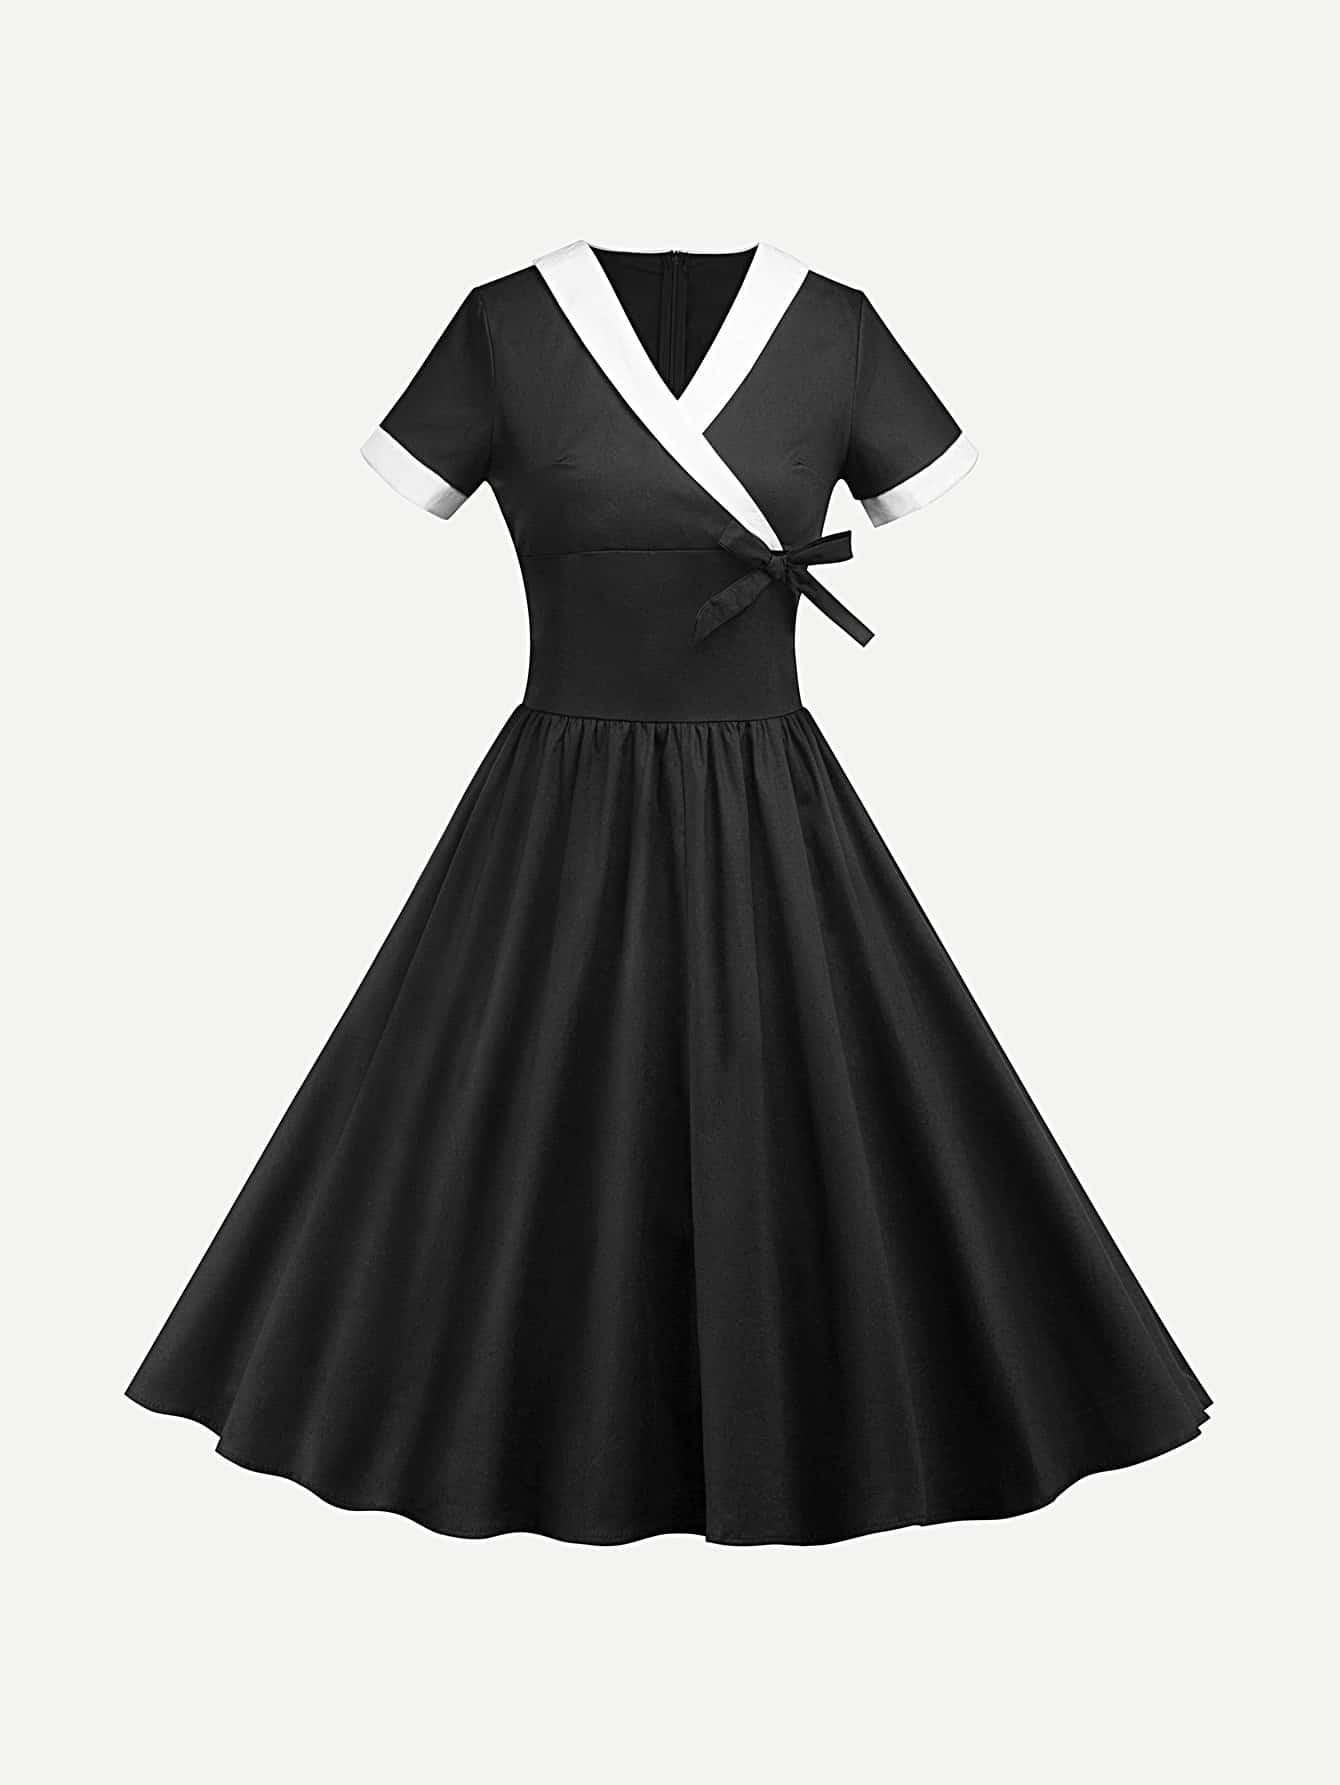 Contrast Trim Knot Detail Dress женские блузки и рубашки v blusa cs7457